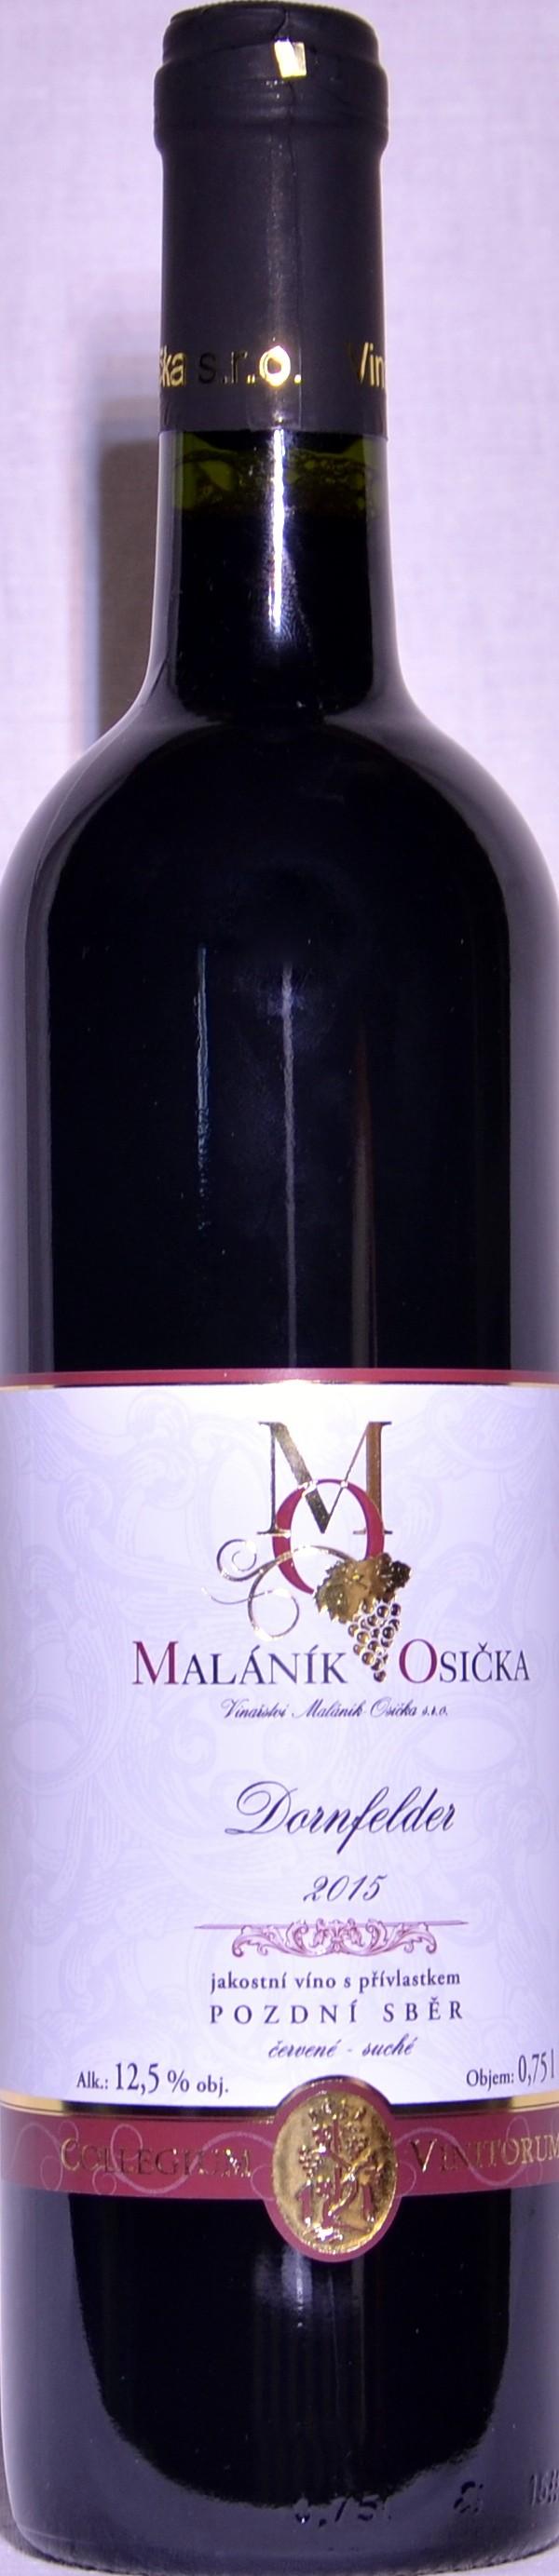 https://www.wineandgallery.cz/385-thickbox_default/dornfelder.jpg